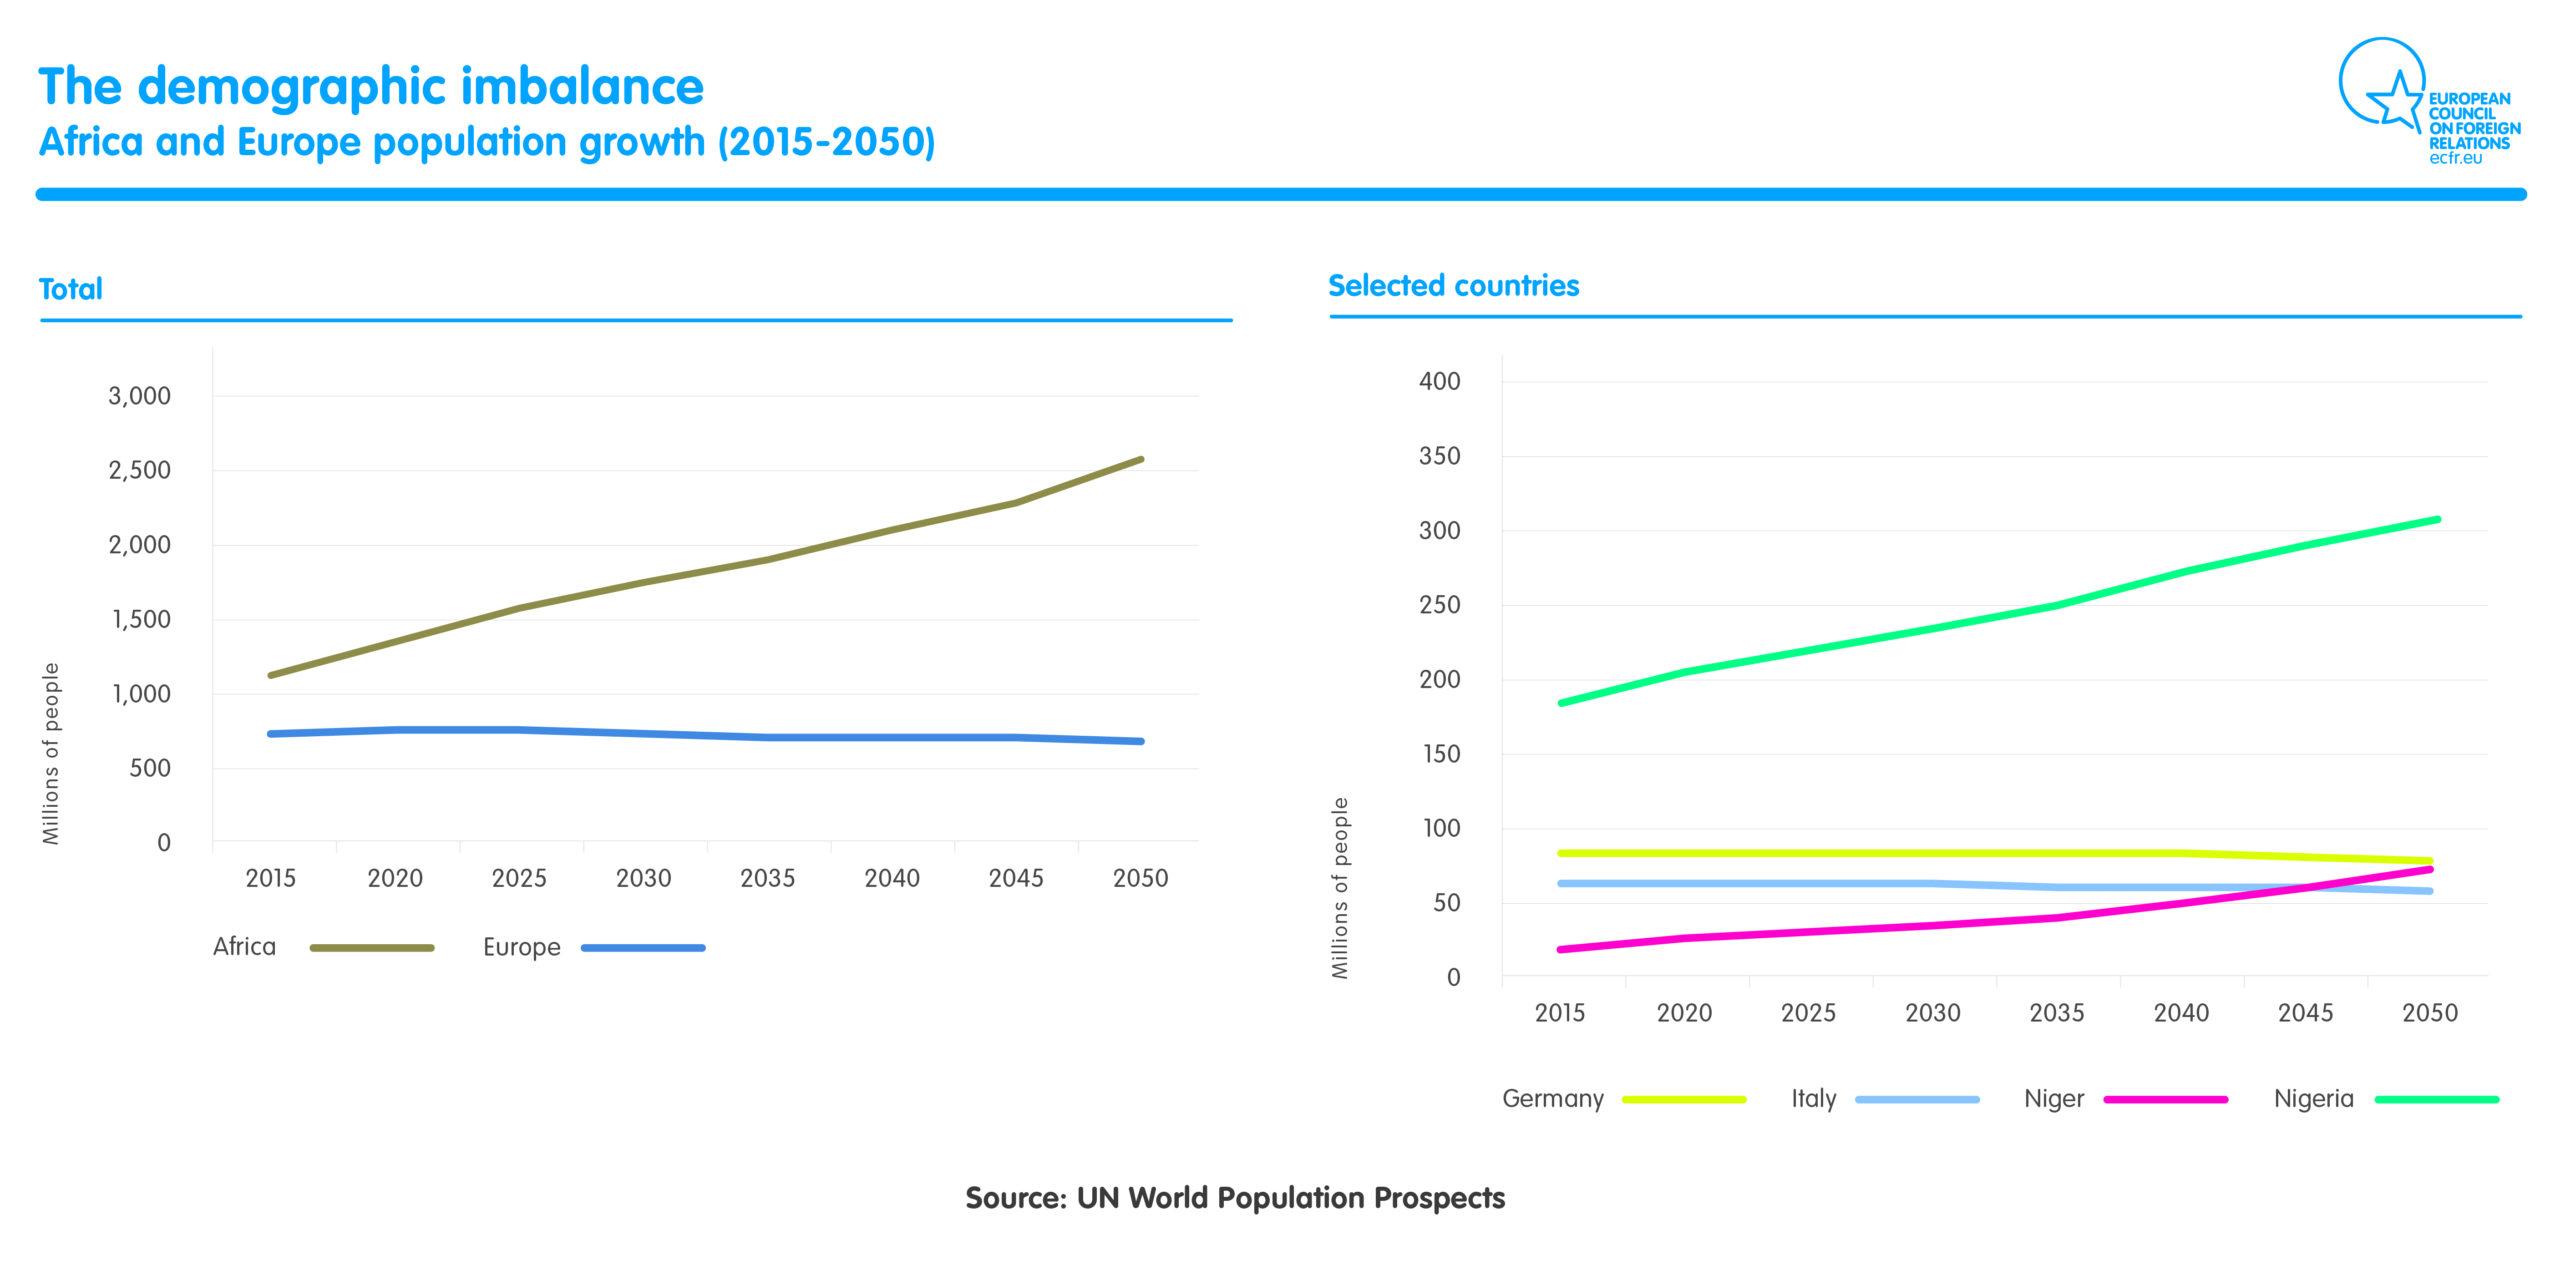 Demographic imbalance